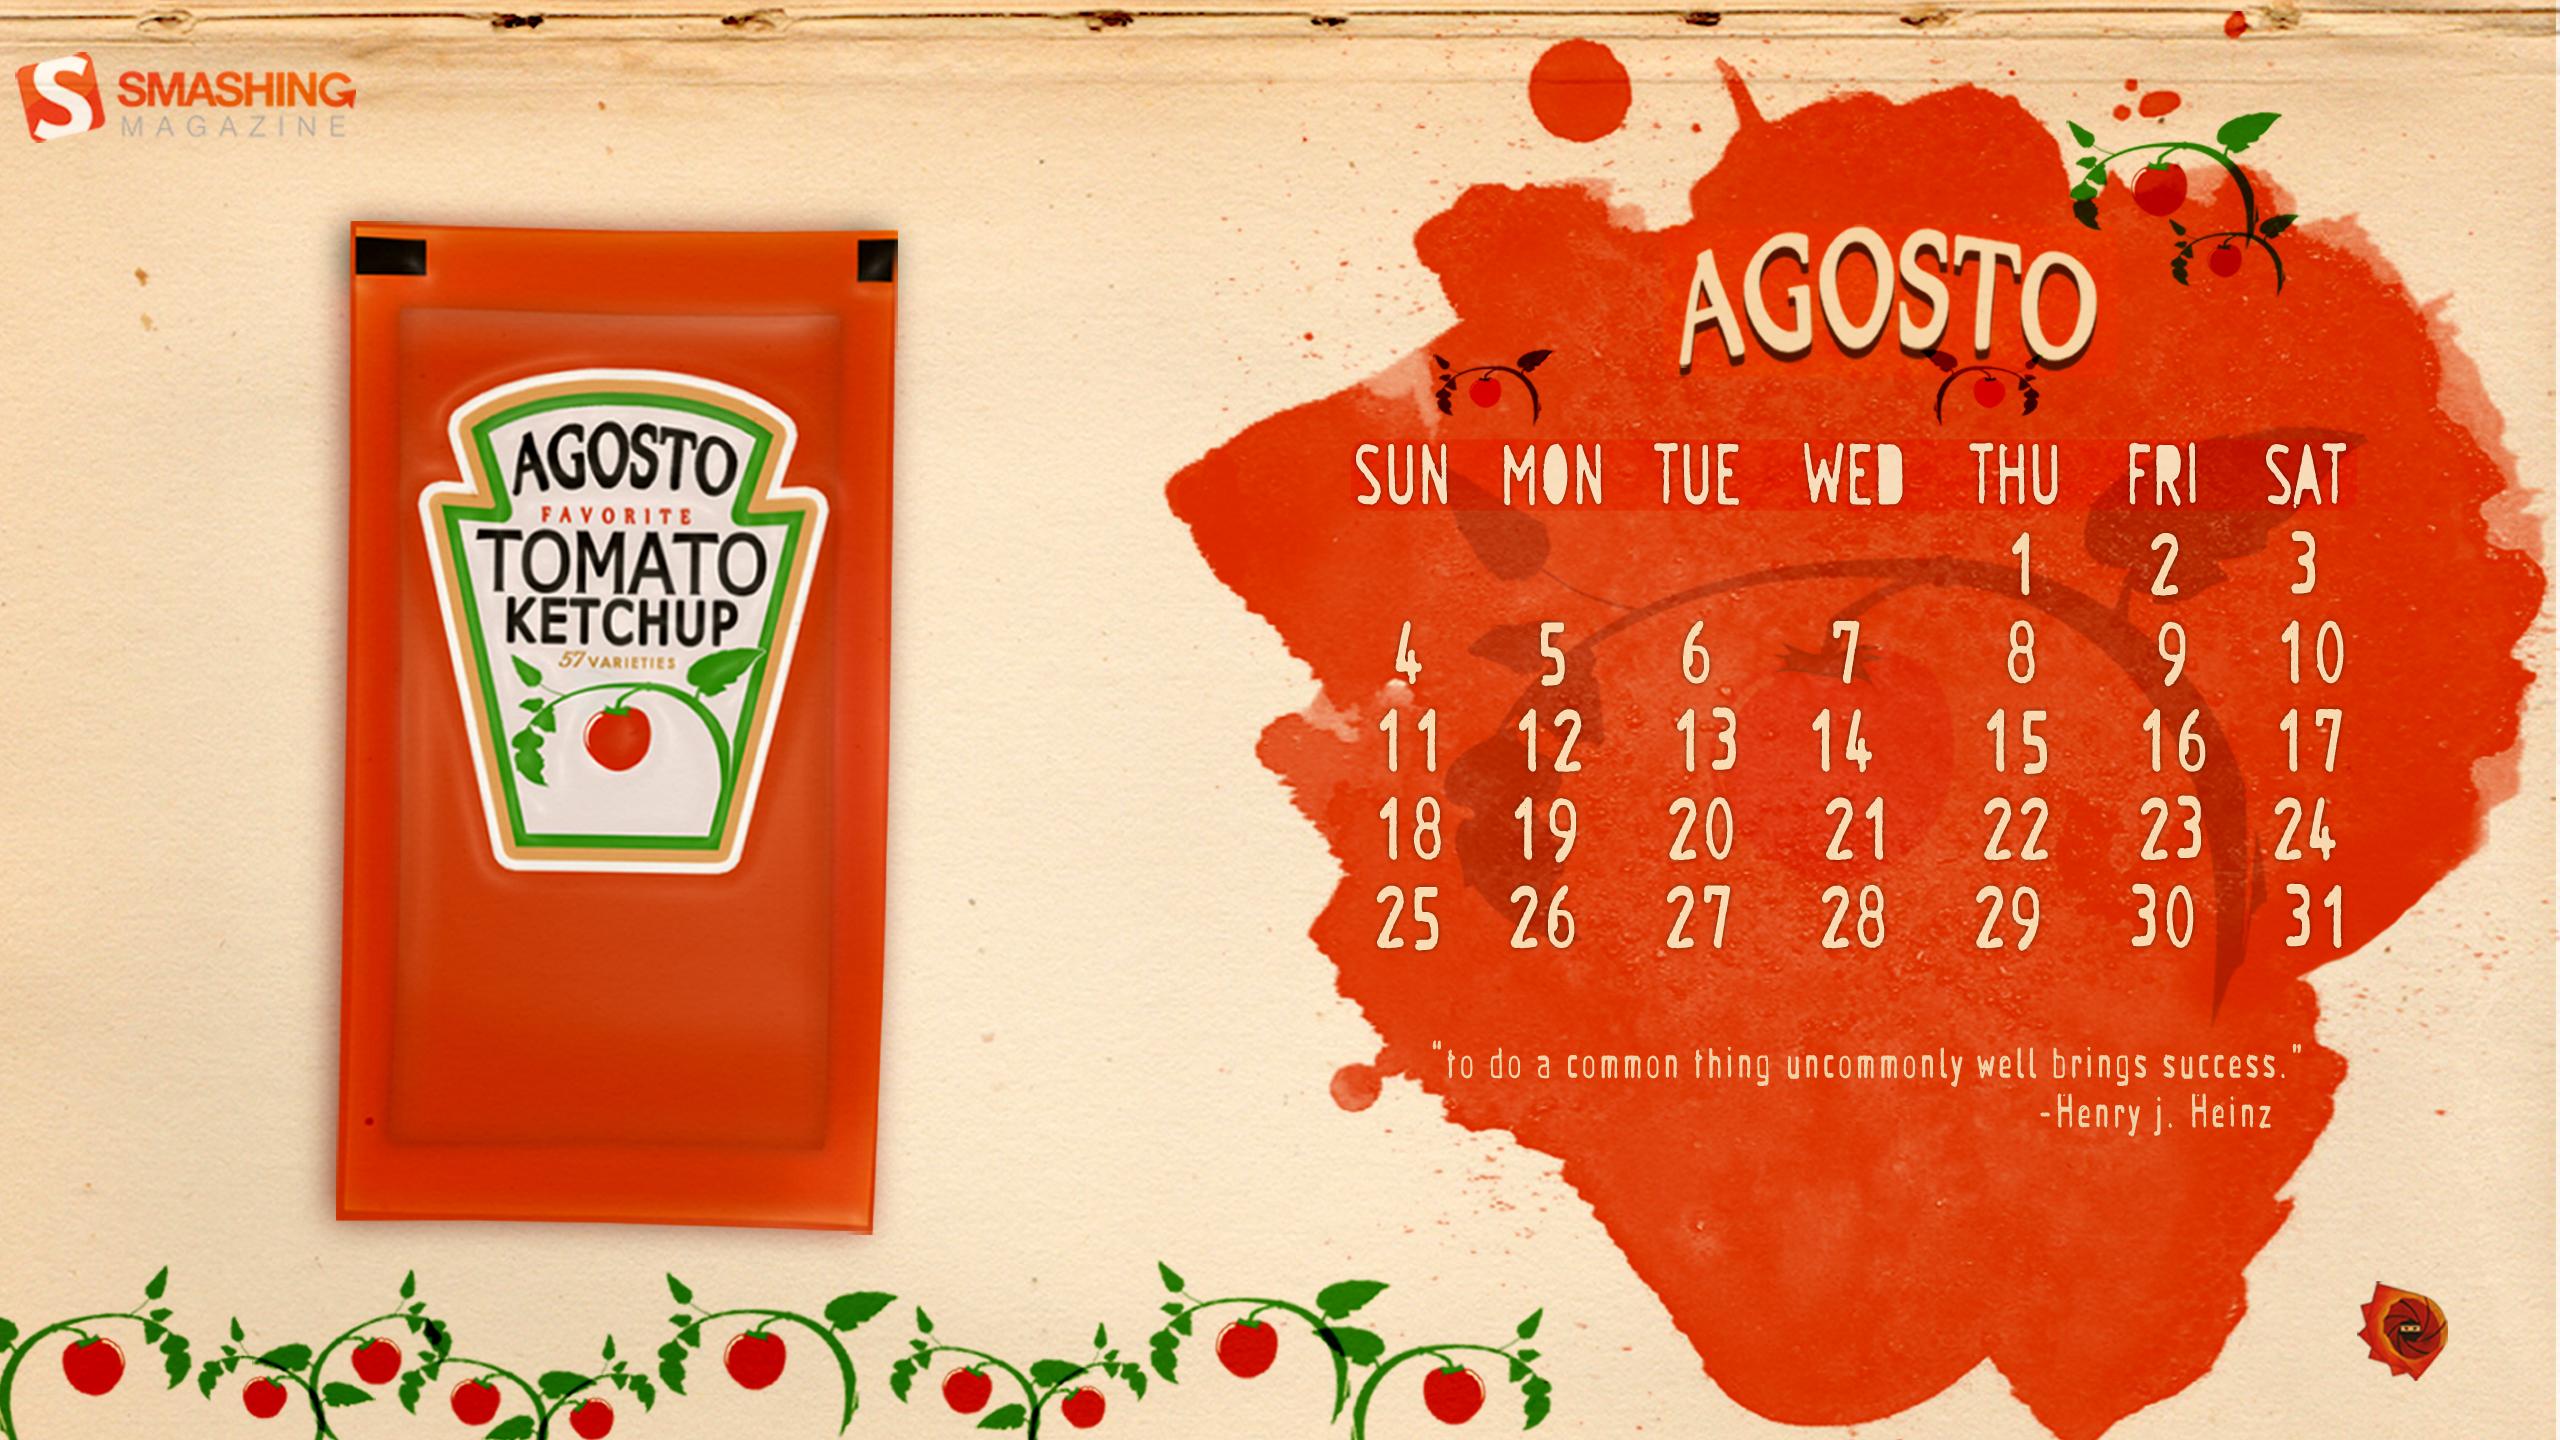 Desktop Wallpaper Calendars August 2013 Smashing Magazine 2560x1440